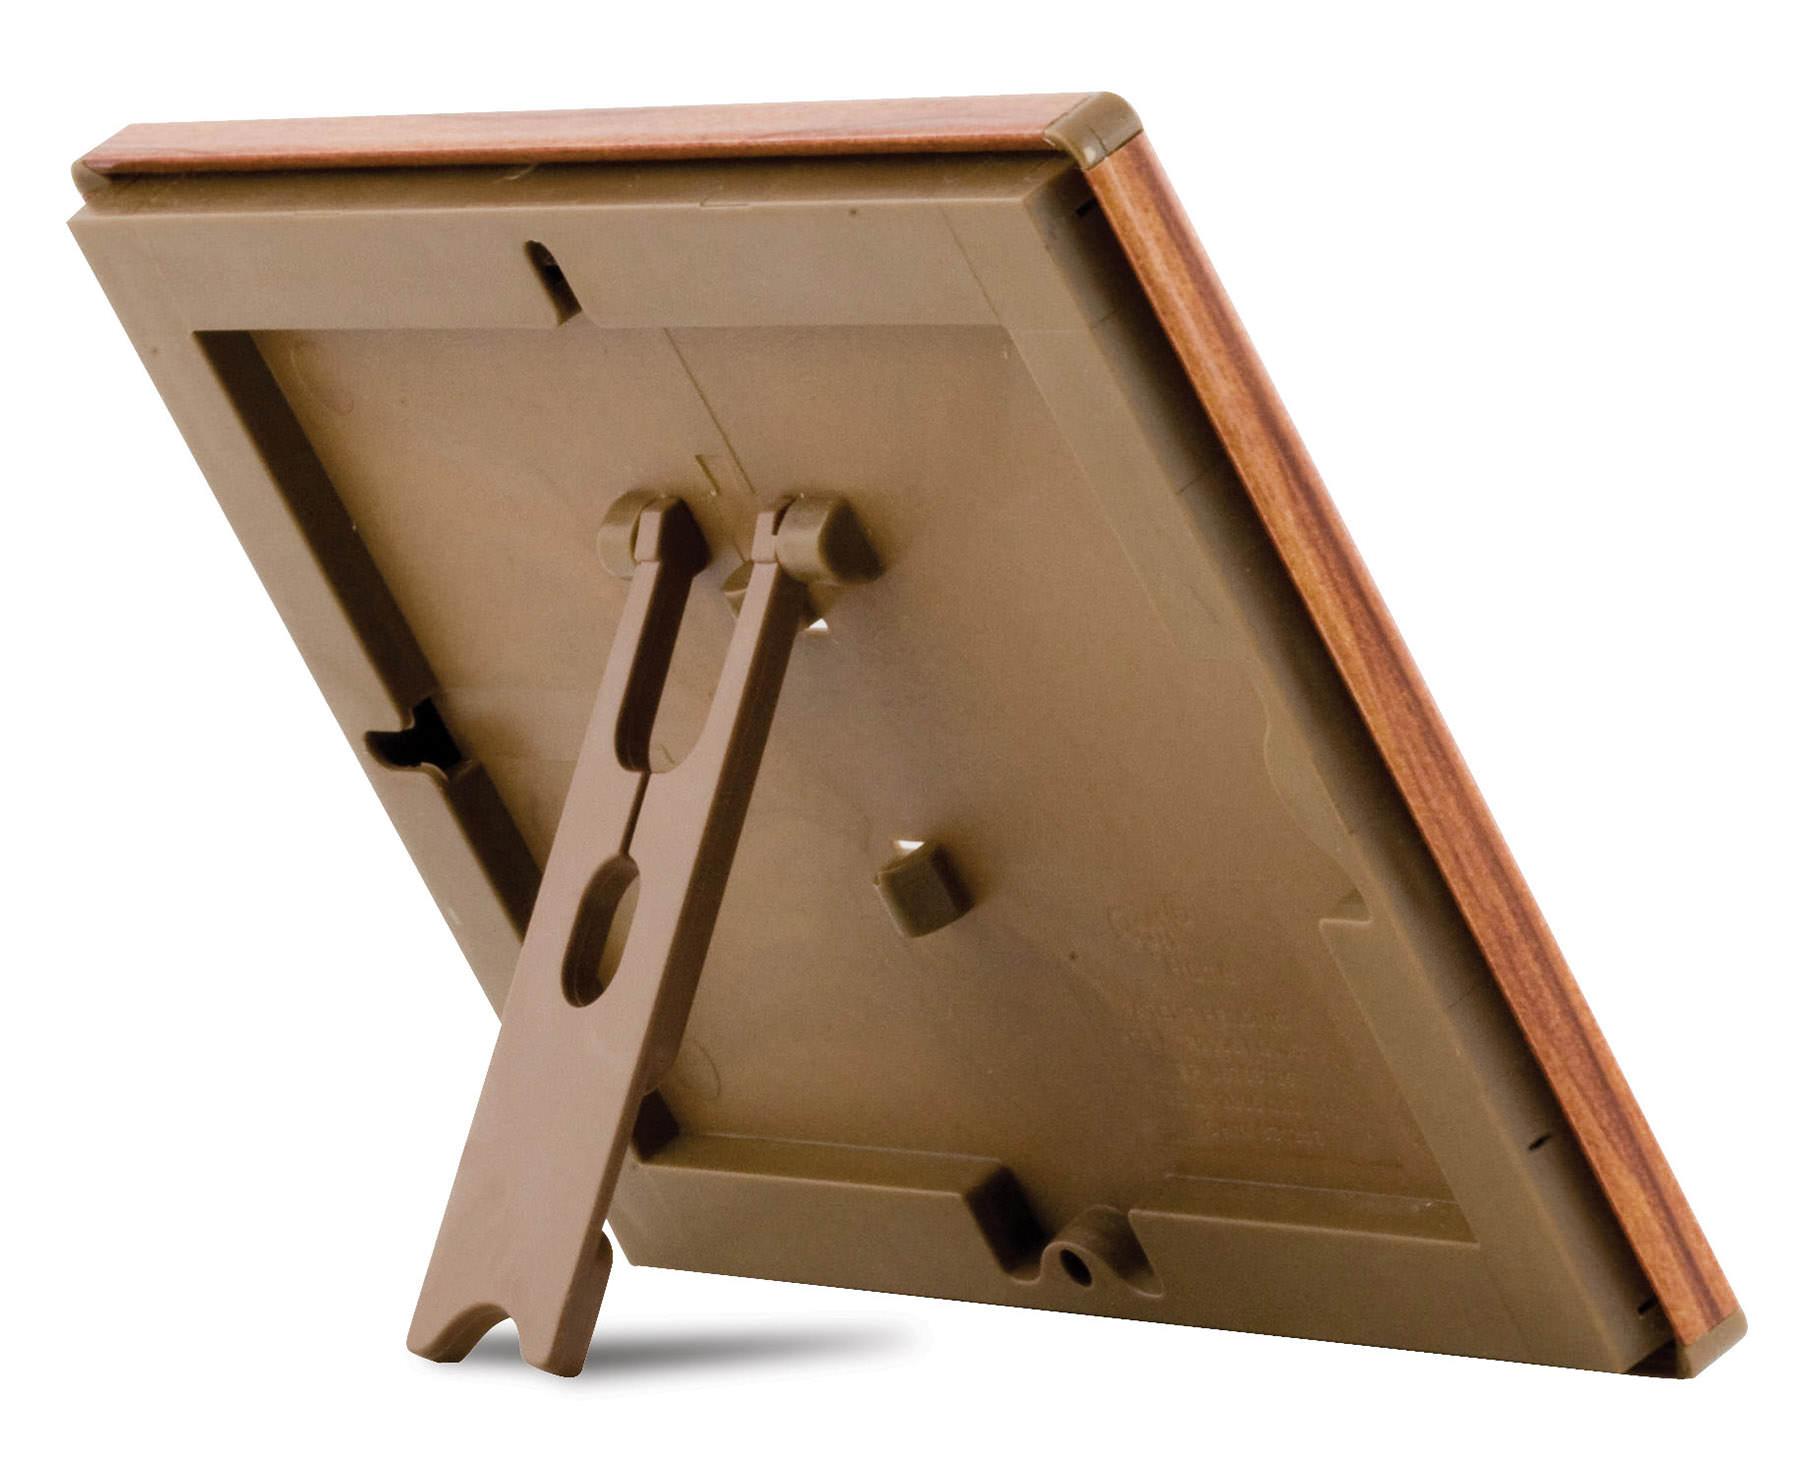 klapprahmen opti wood alu 25 mm bilderrahmen. Black Bedroom Furniture Sets. Home Design Ideas